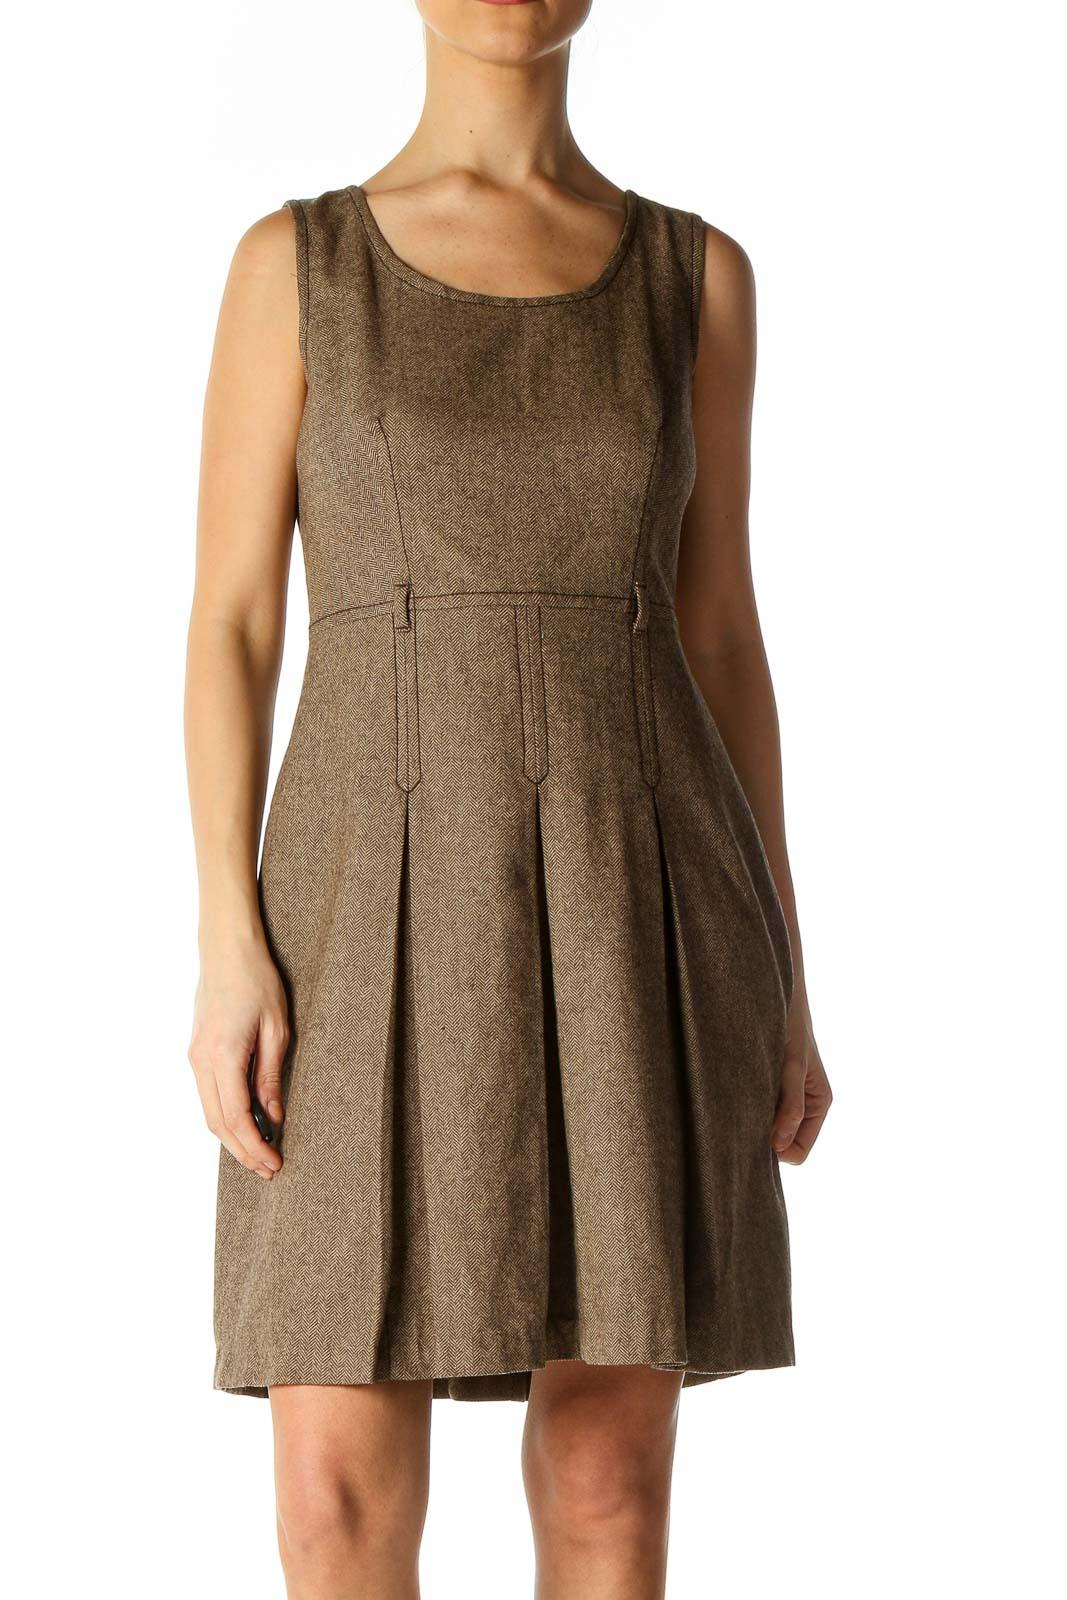 Brown Bohemian A-Line Dress Front